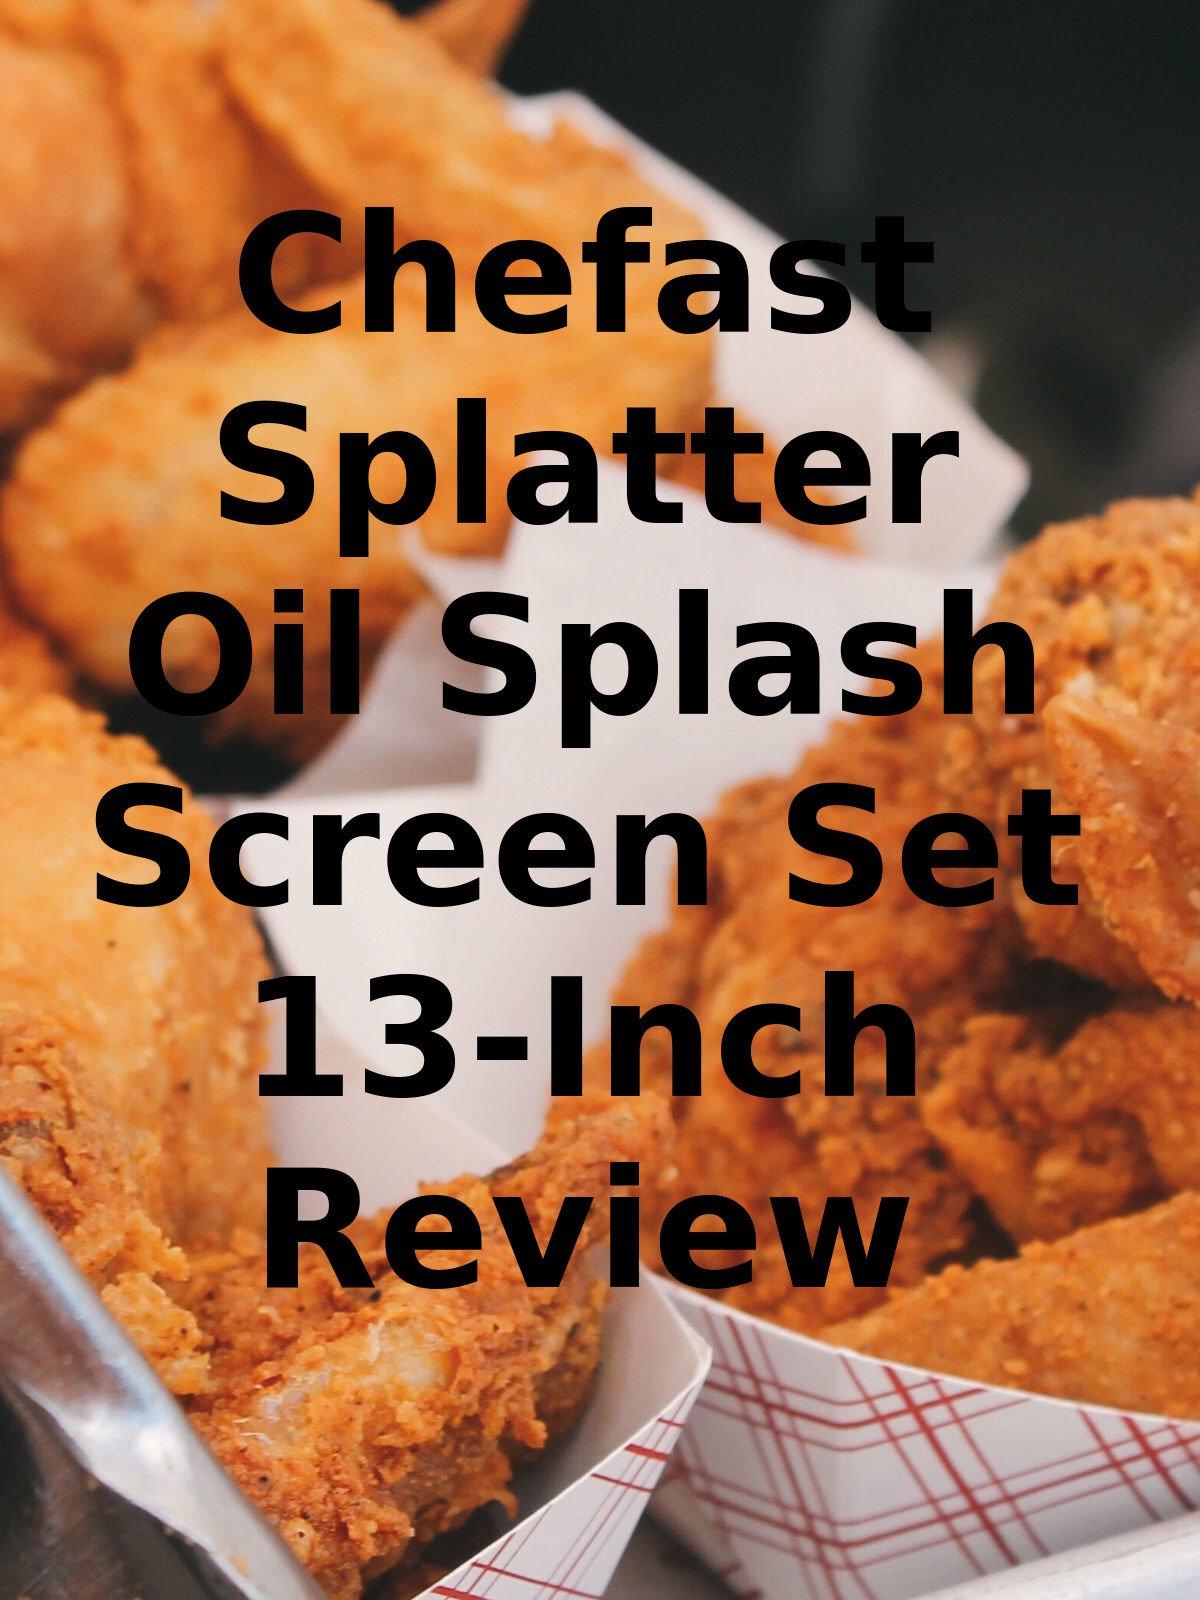 Review: Chefast Splatter Oil Splash Screen Set 13-Inch Review